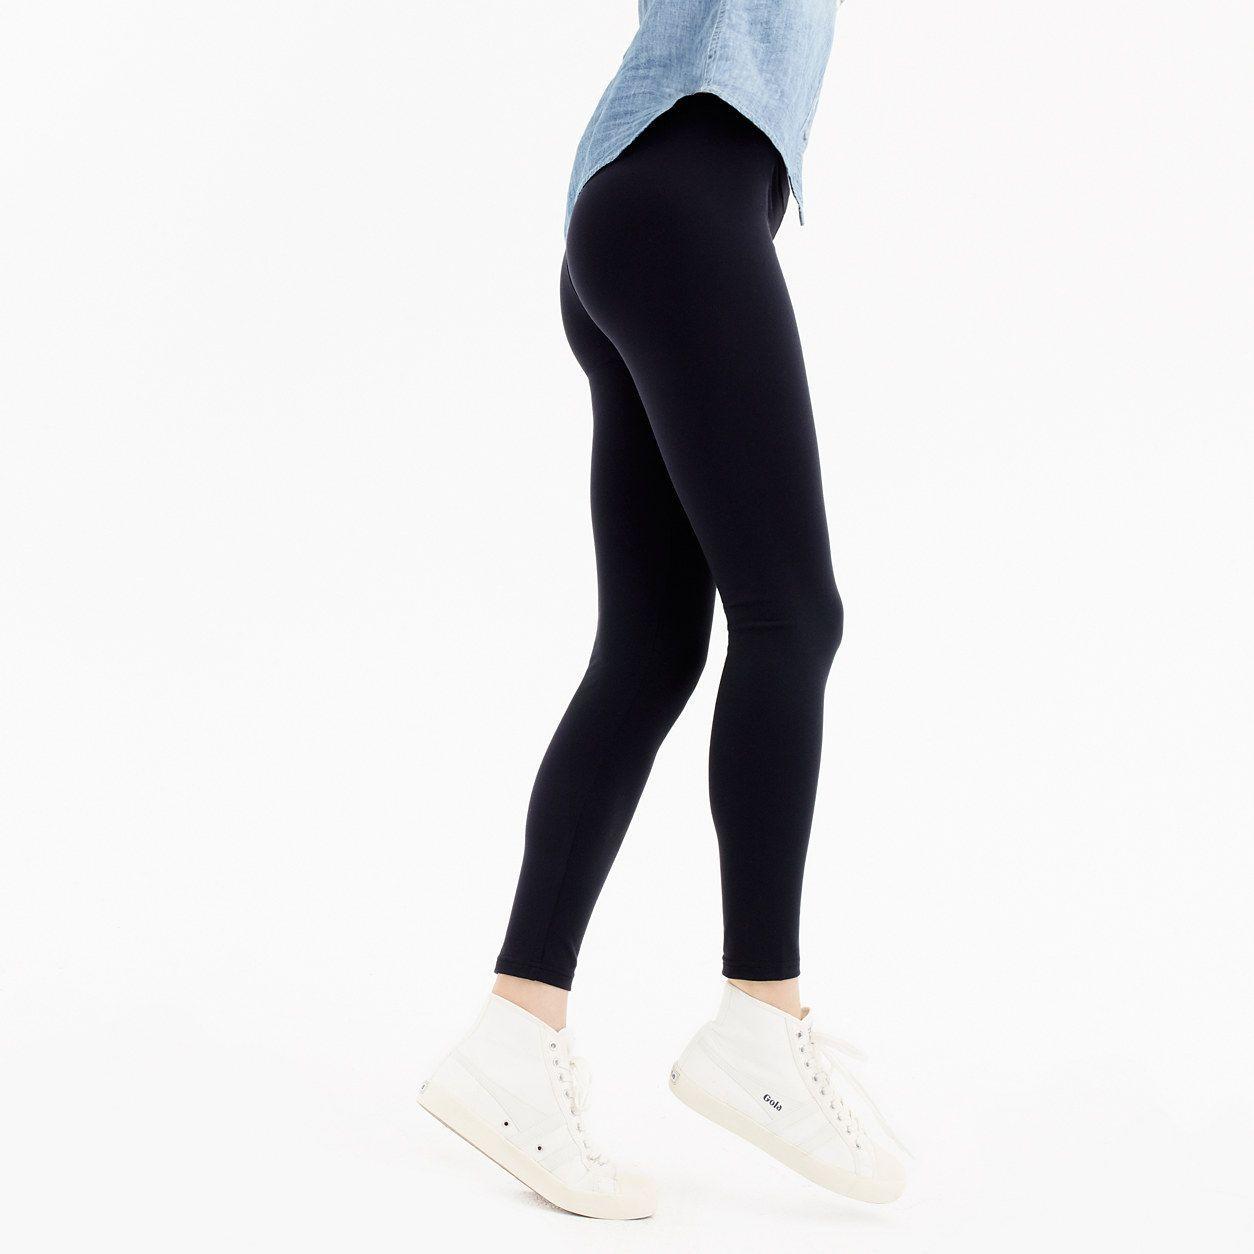 dd950bbf0ec4c4 J.Crew Womens New Signature Leggings (Size XXS)   Products ...